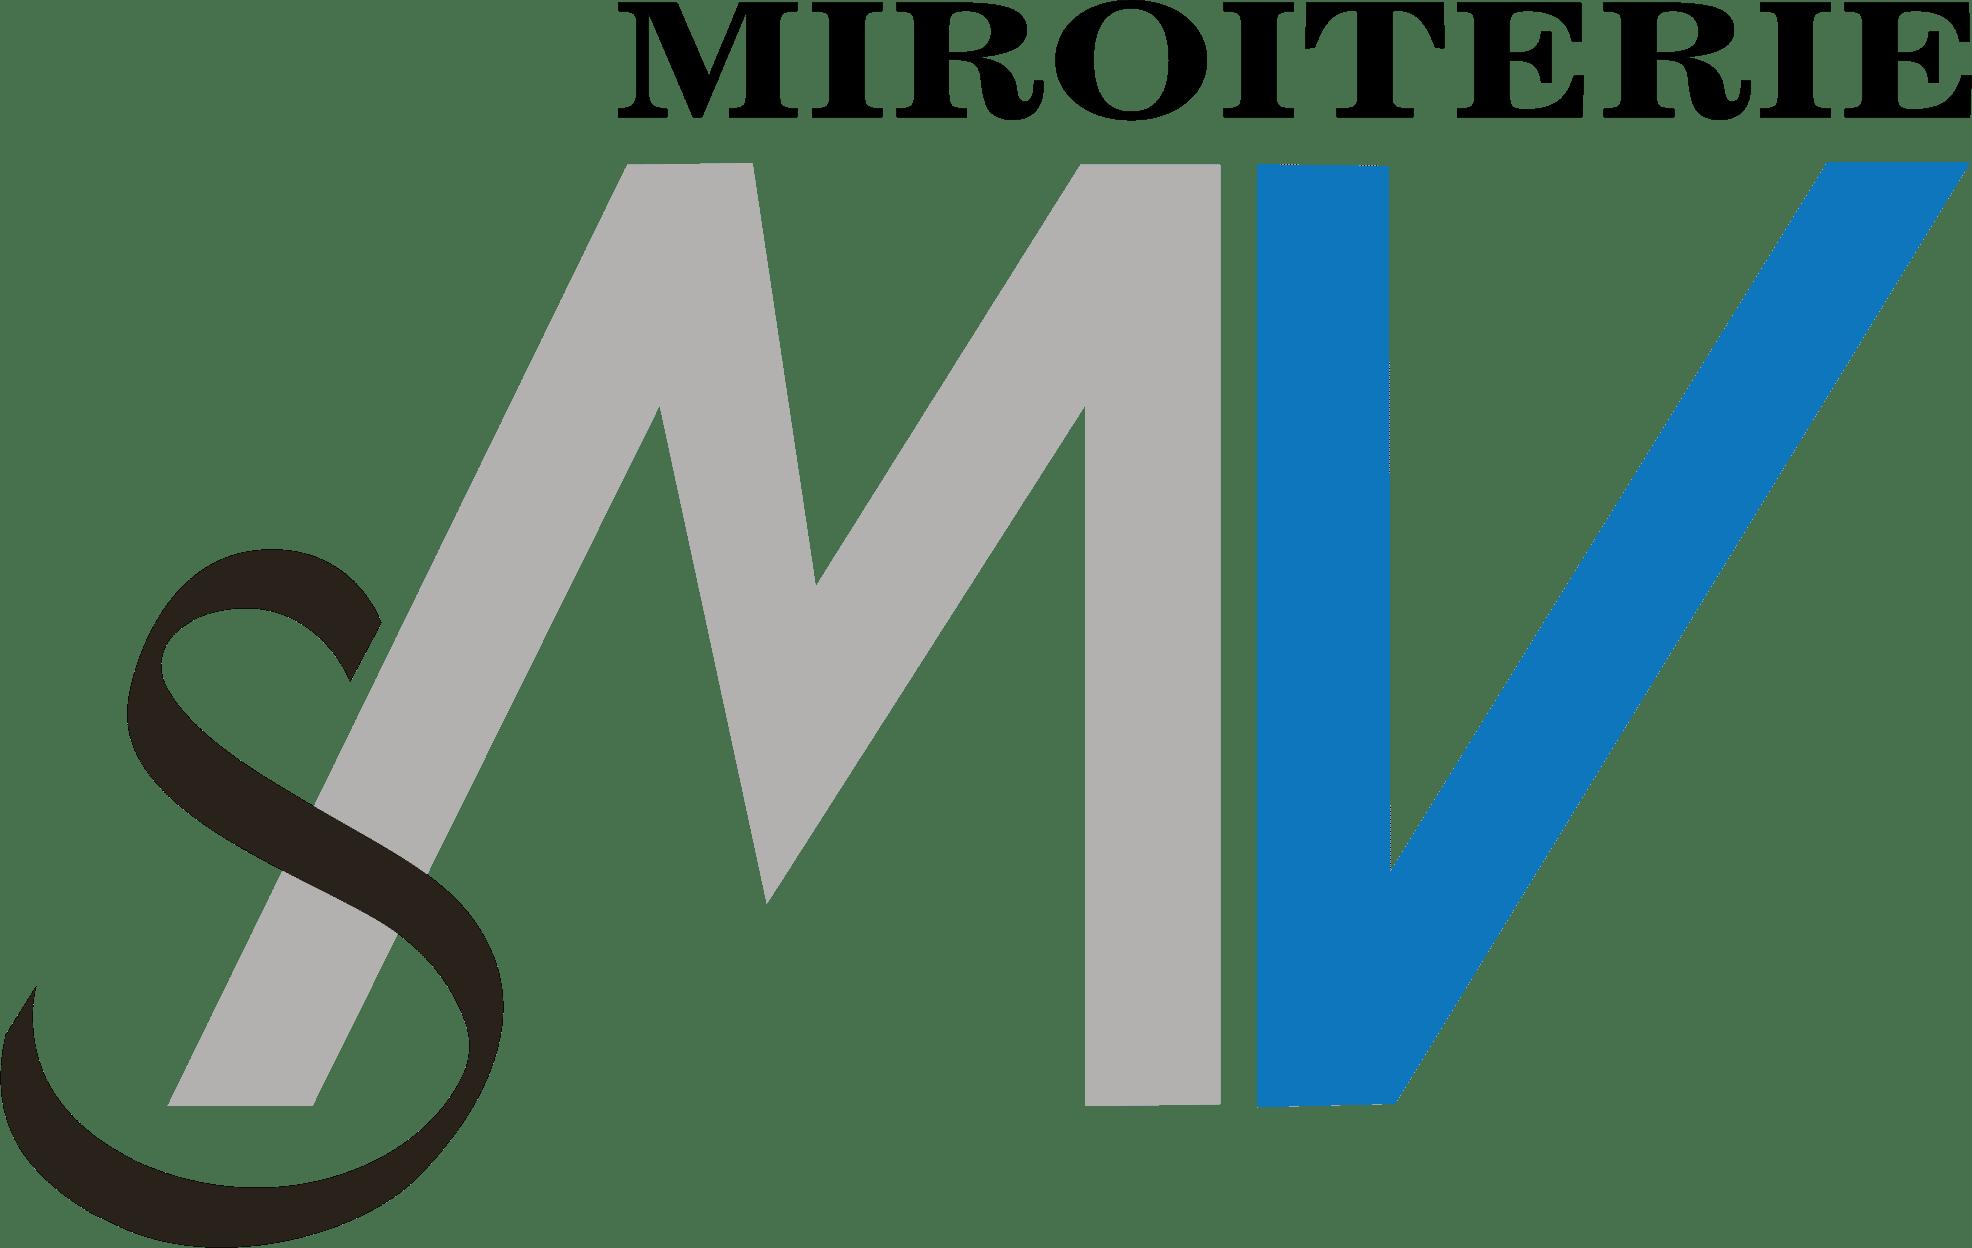 Logo Miroiterie SMV